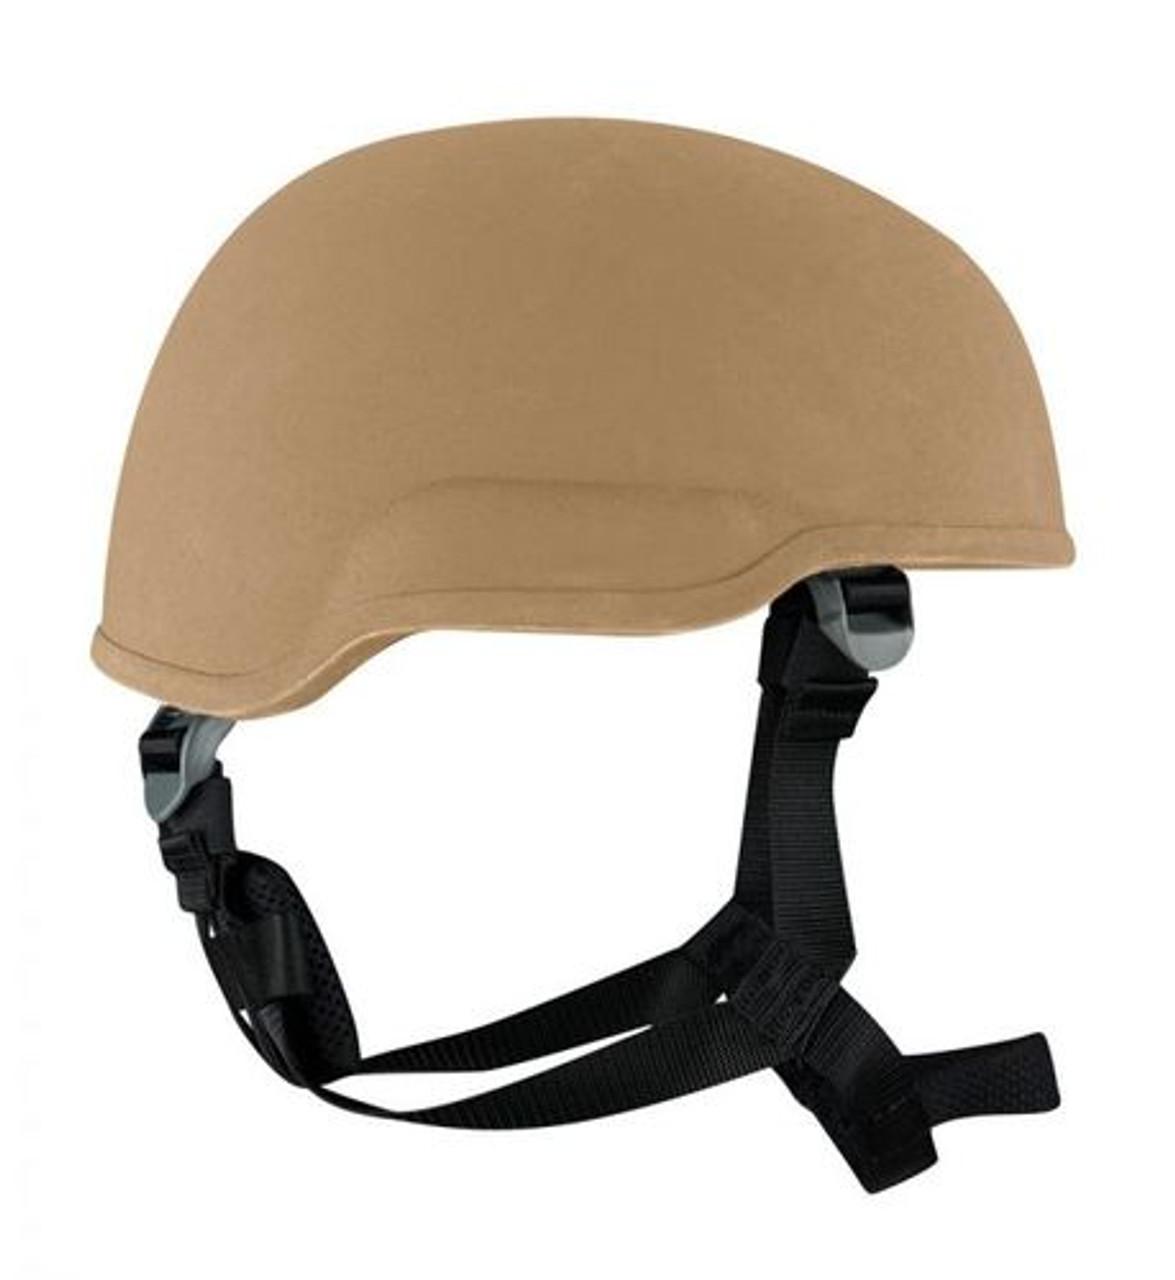 Propper ACH II Tactical Bulletproof Helmet, Available in Black, Tan, or Ranger Green